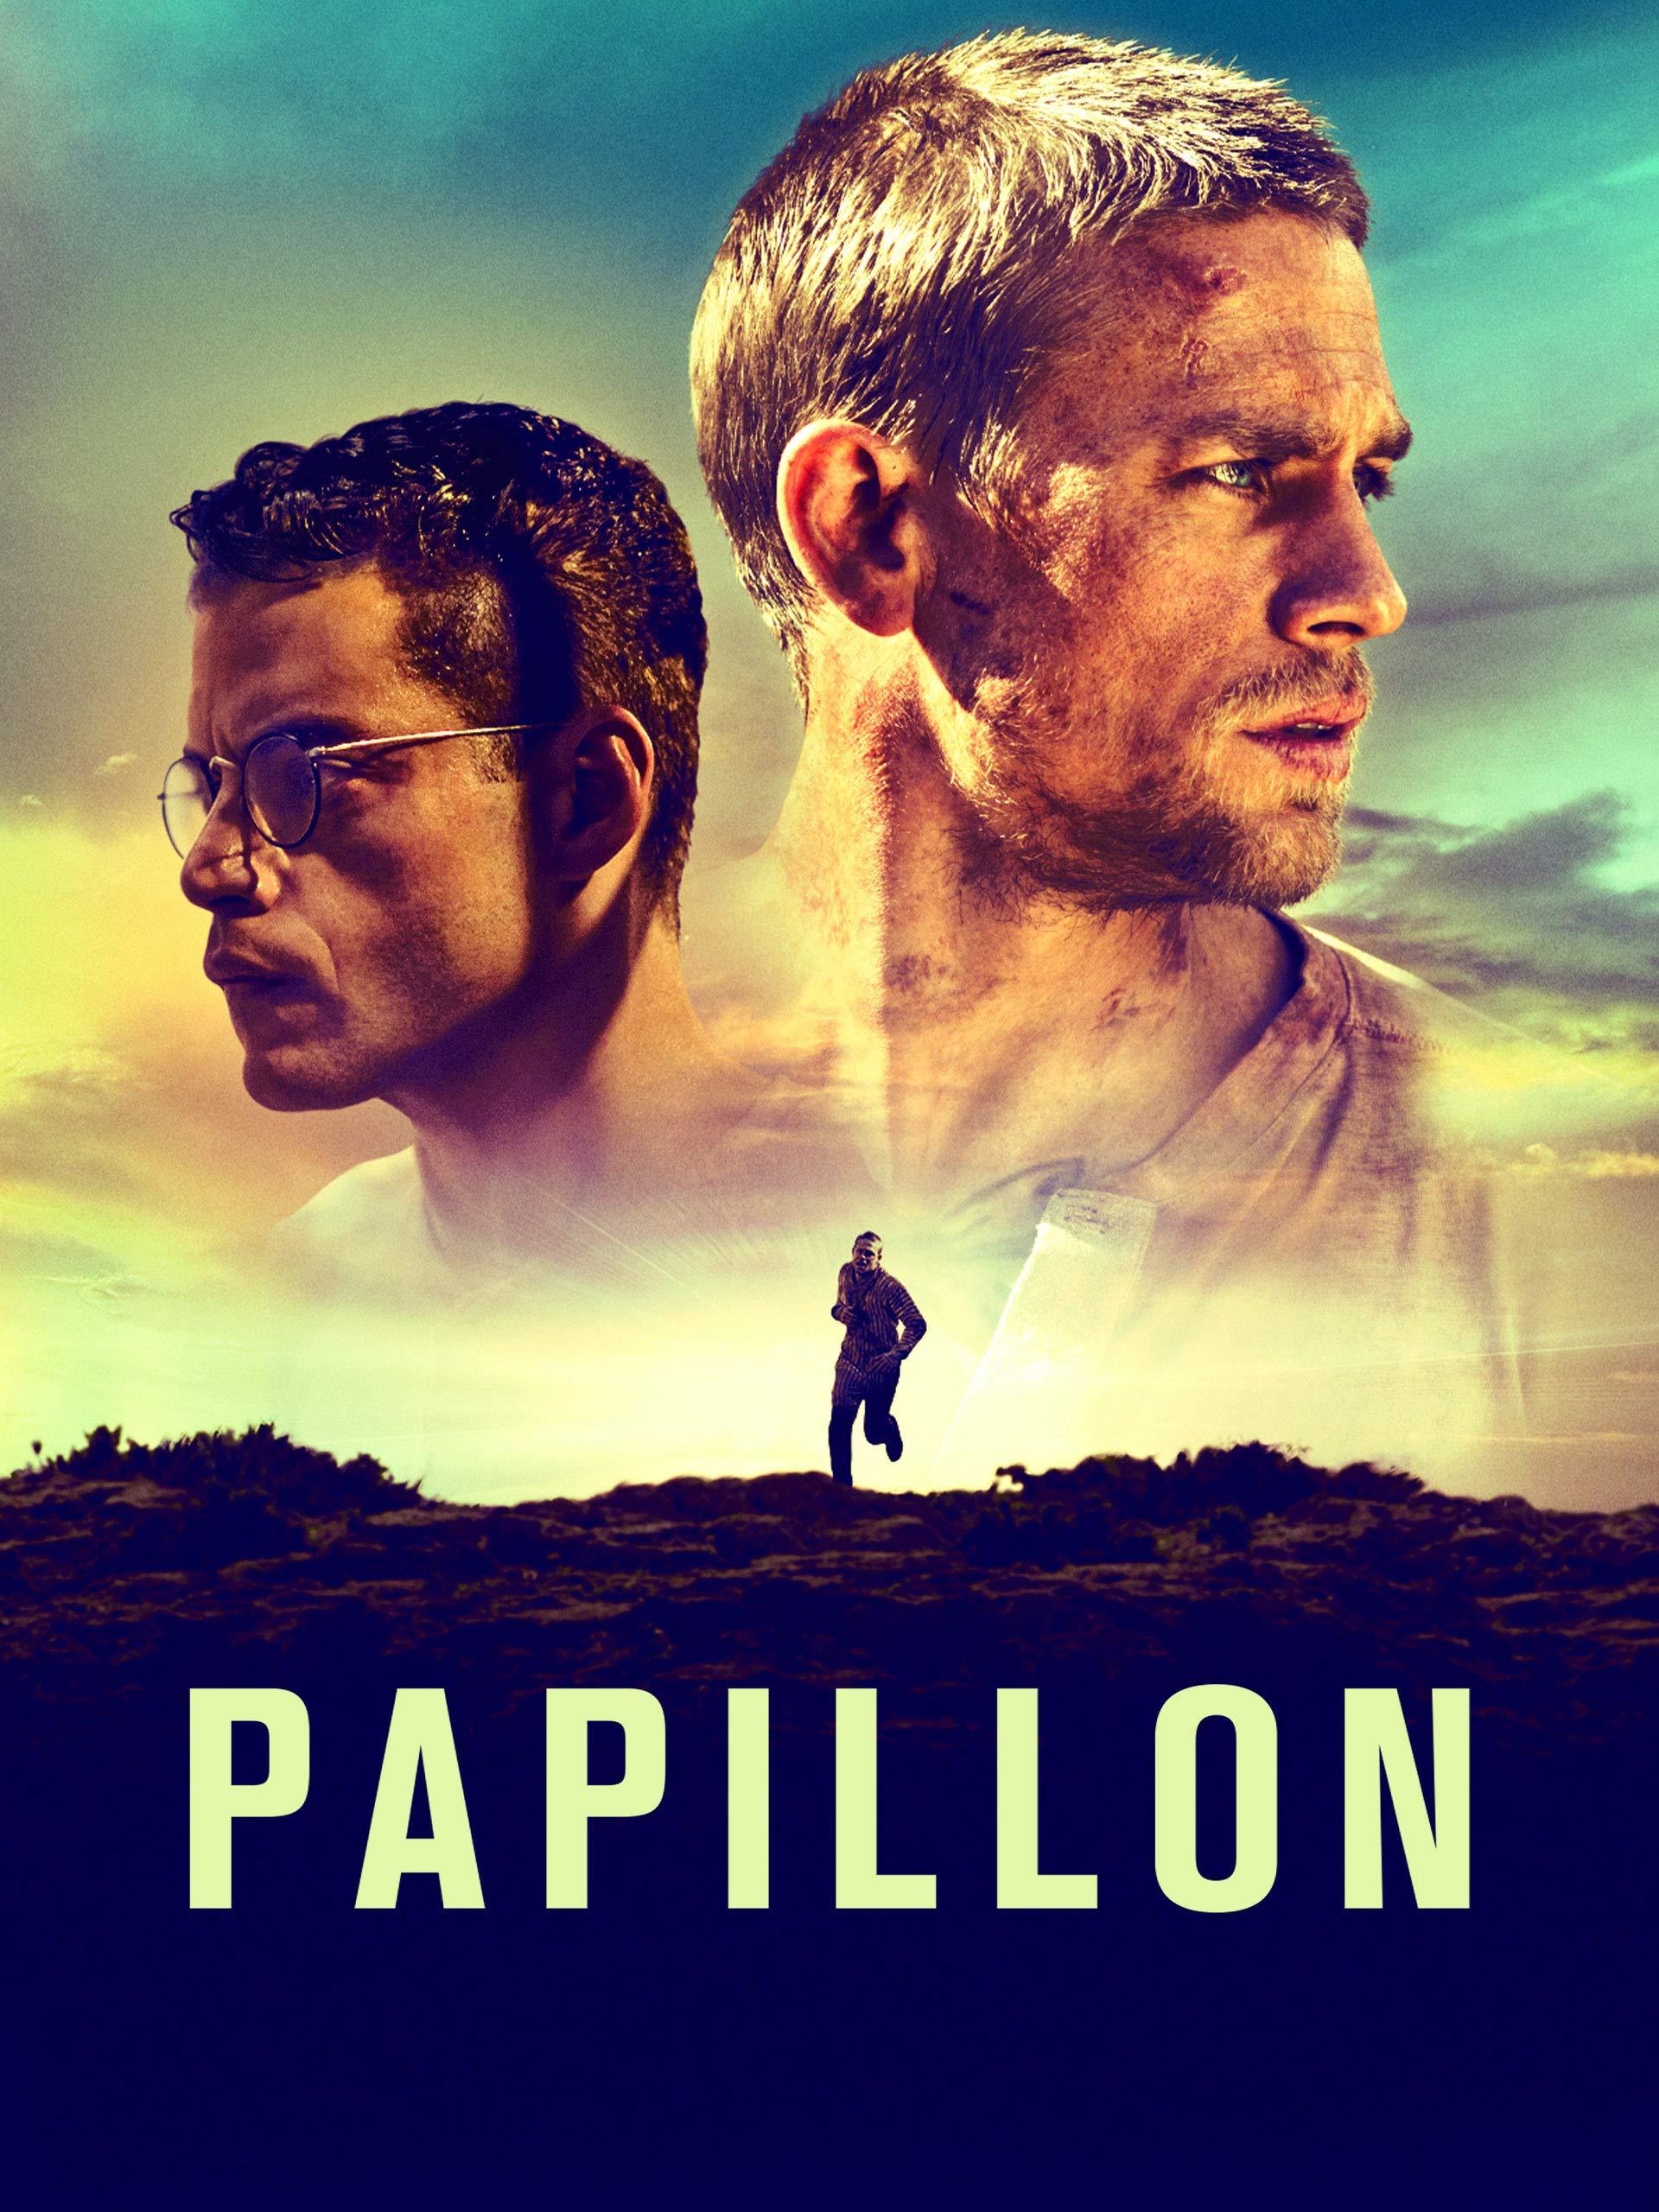 Amazon.de: Papillon [dt./OV] ansehen